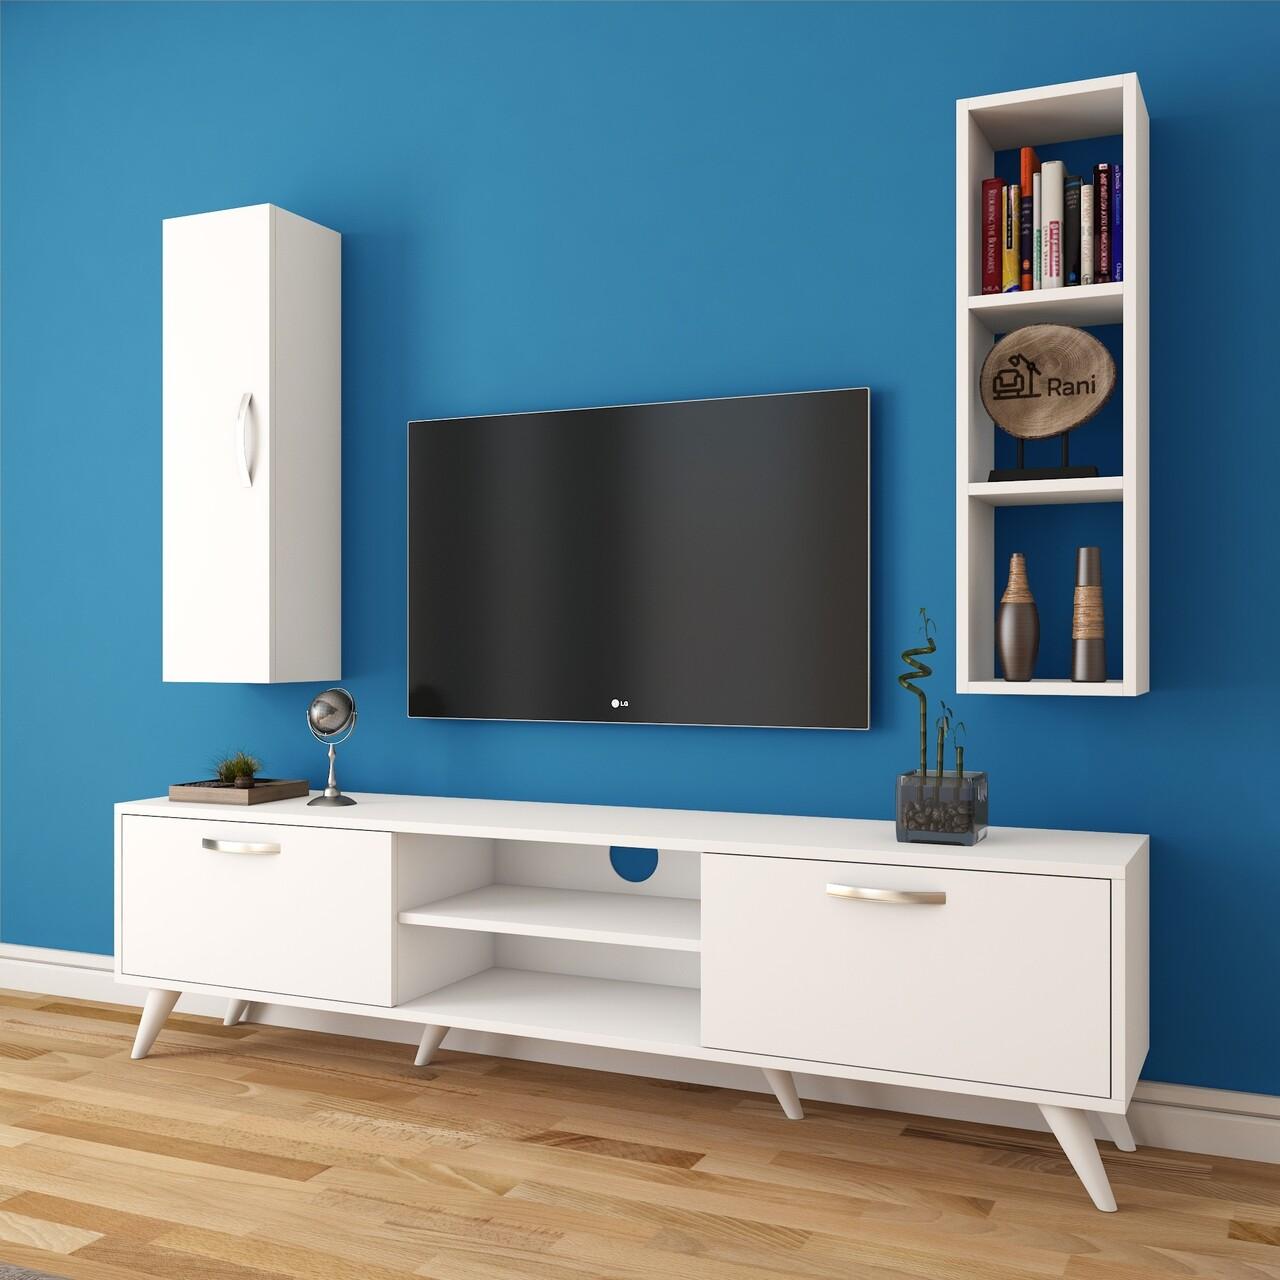 Comoda TV cu raft de perete si cabinet M14 - 257, Wren, 180 x 35 x 48.6 cm/90 cm, white